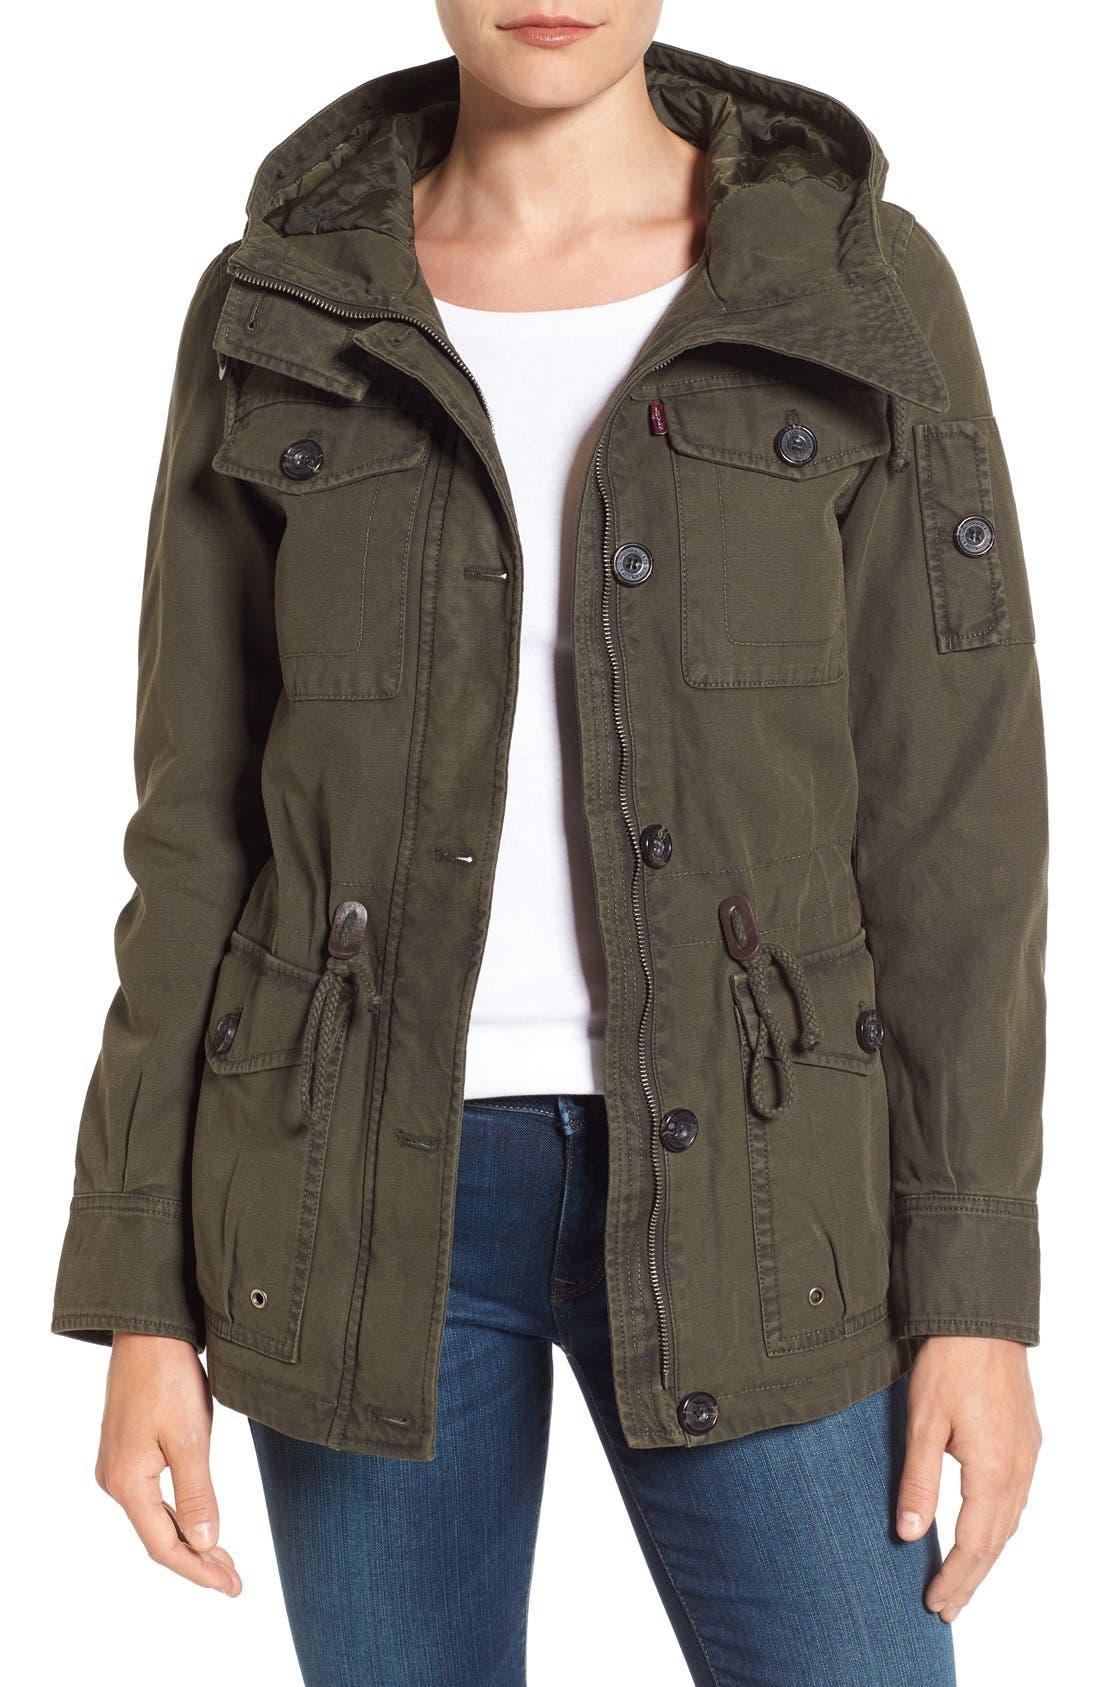 Alternate Image 1 Selected - Levi's® Cotton Twill Utility Jacket